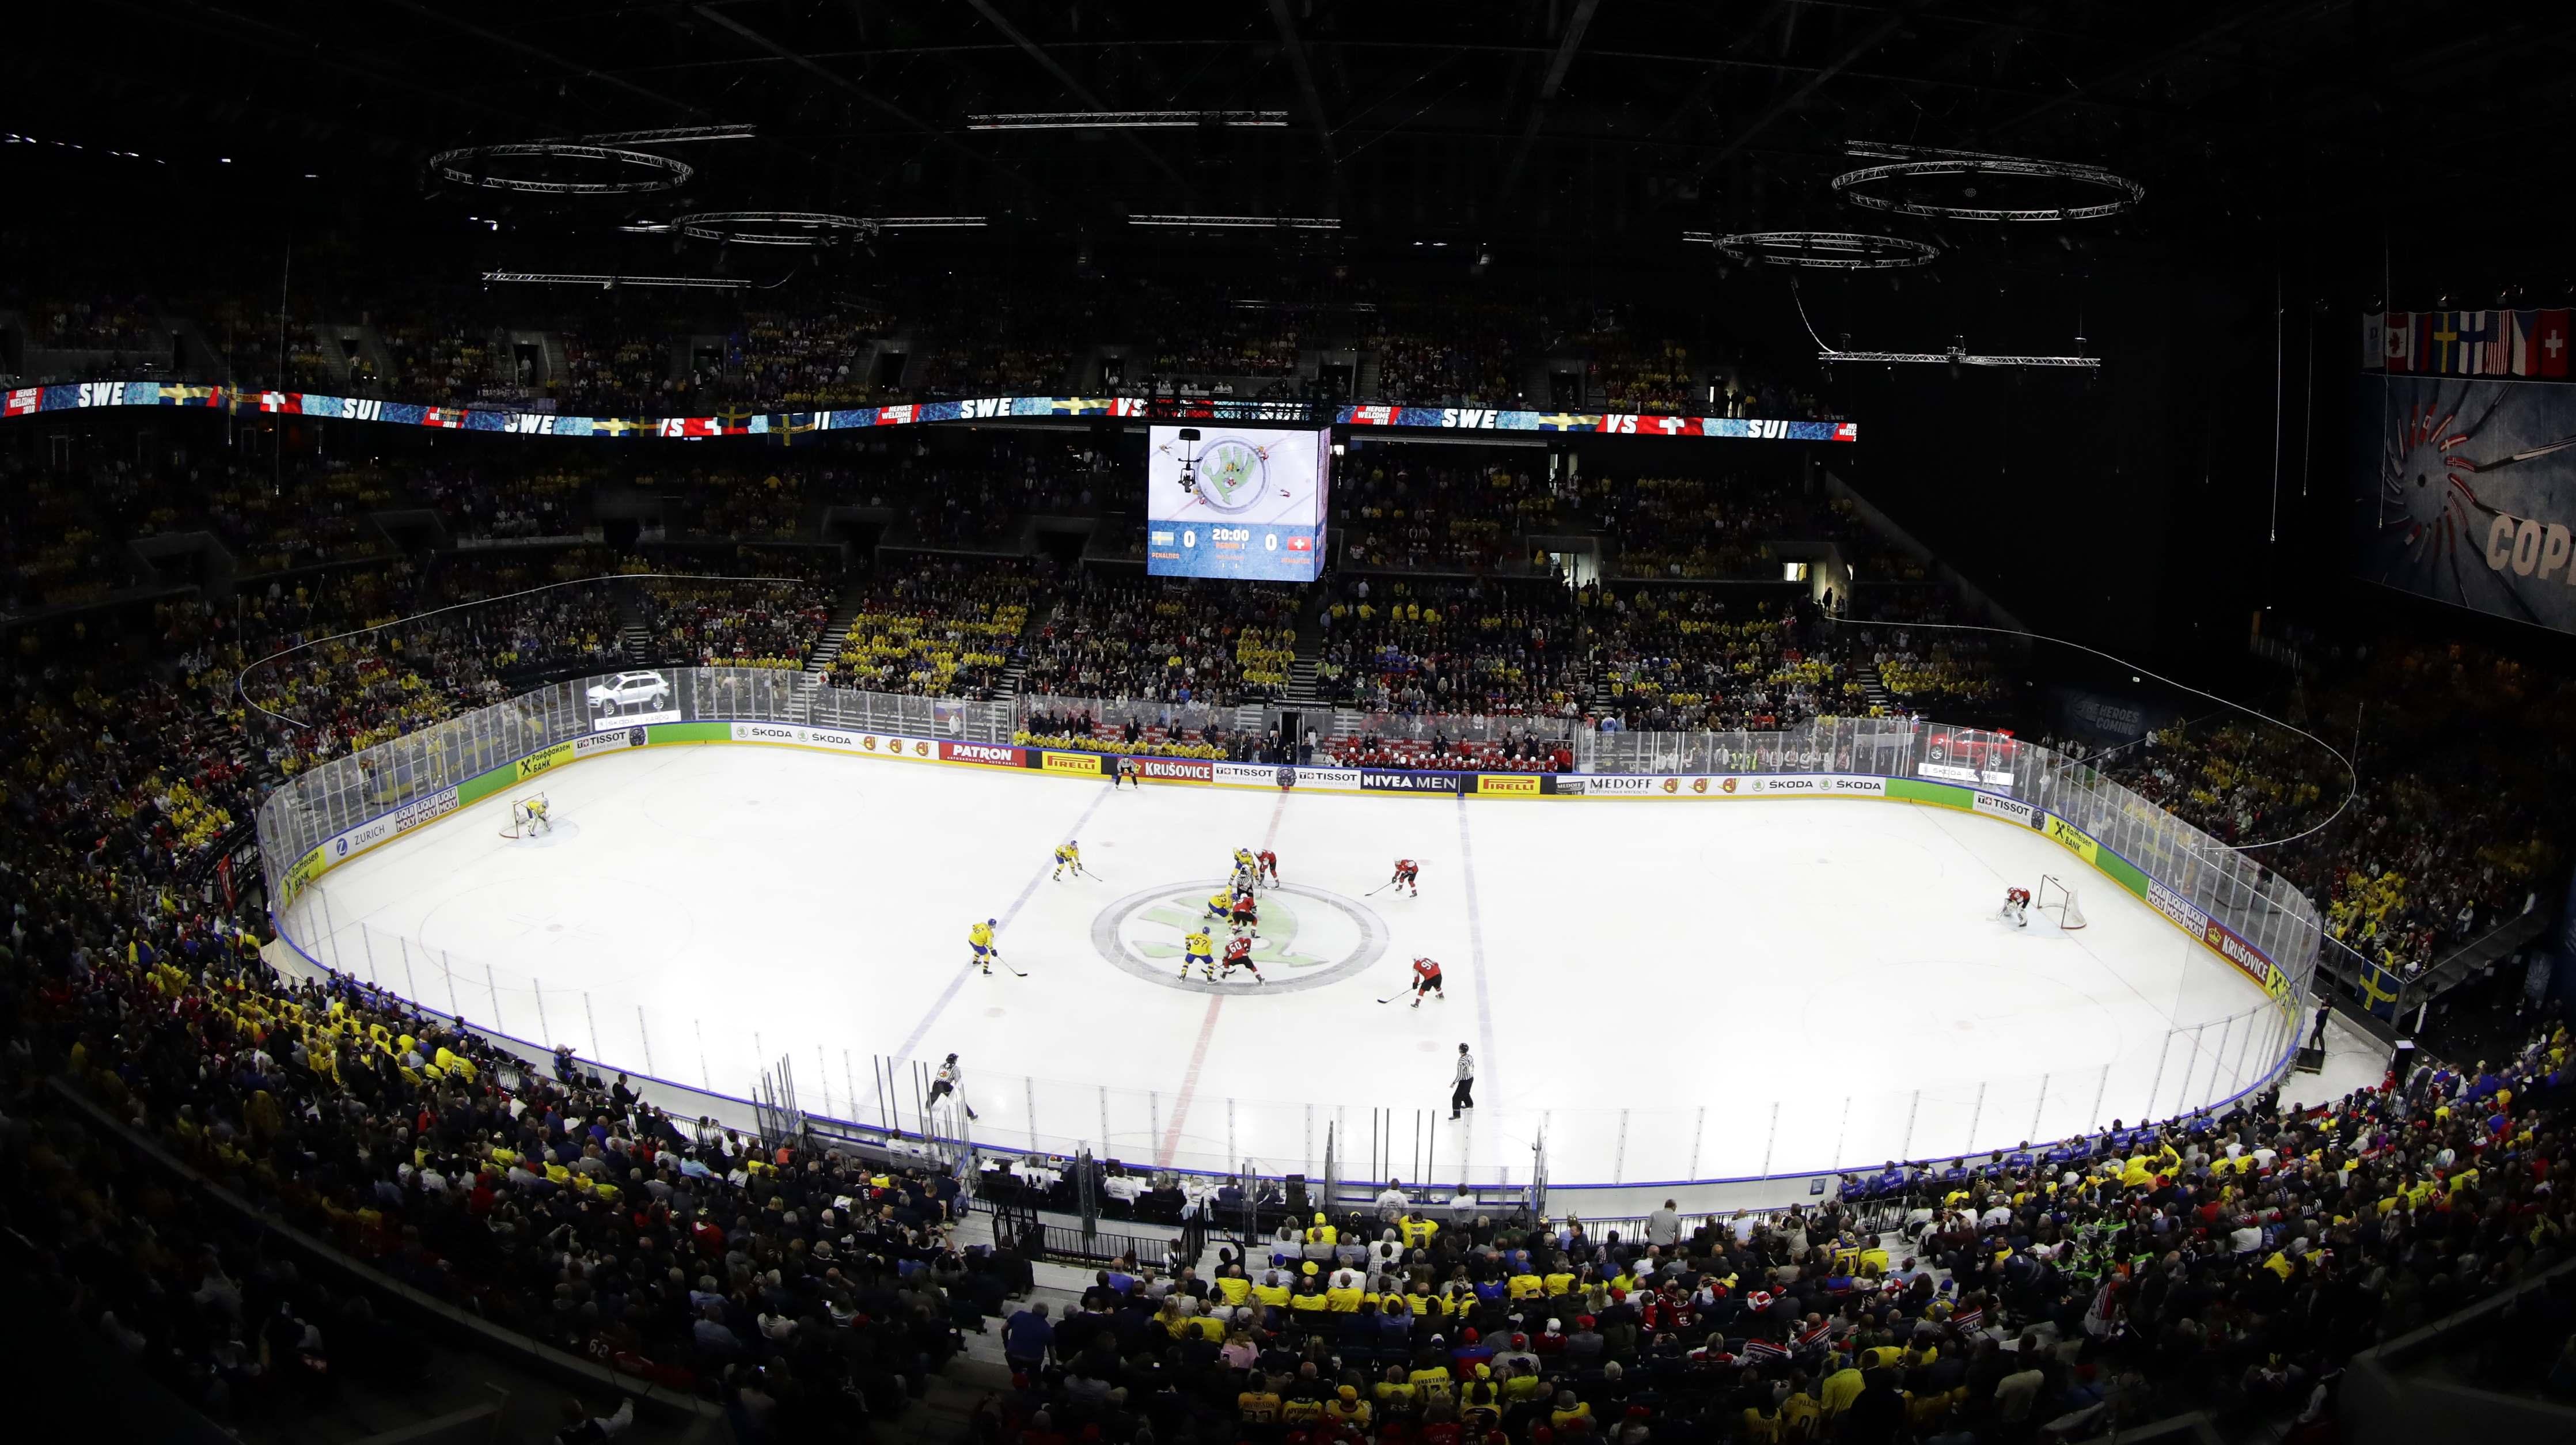 Infront At The 2019 Iihf Ice Hockey World Championship